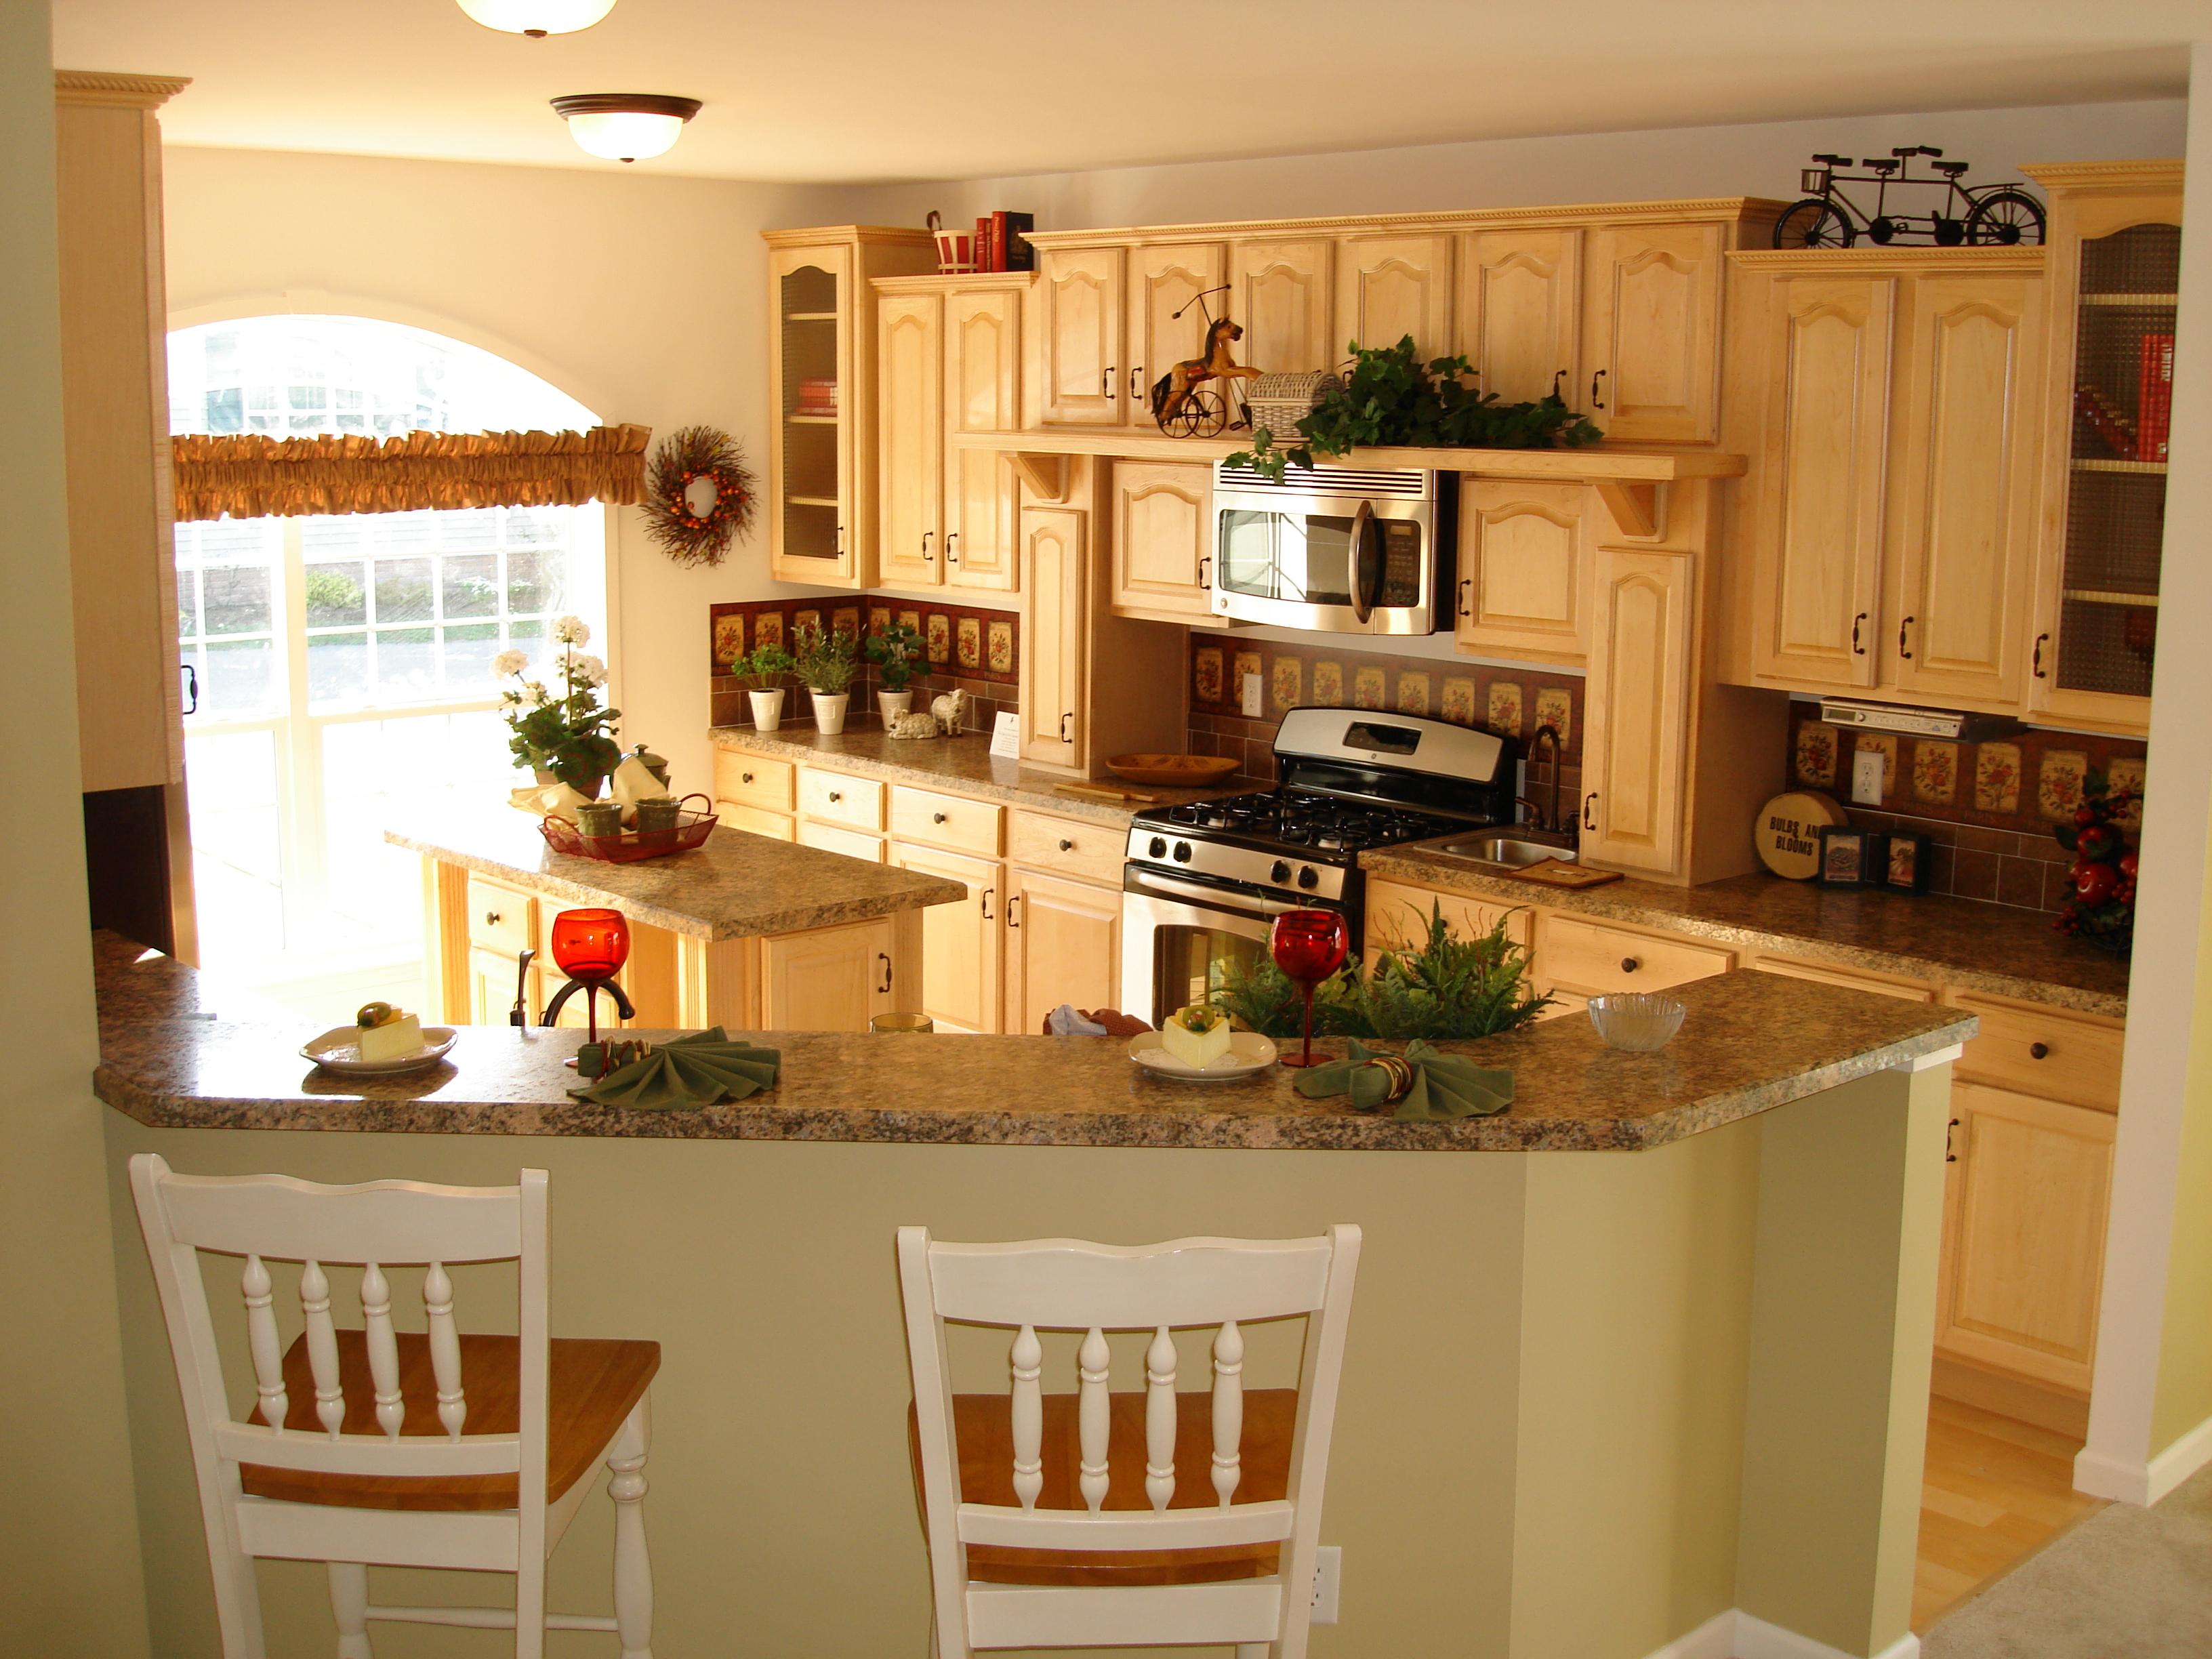 mobile home kitchen cabinets for sale flush mount lights pennwest covington ii model hf116 a ranch style modular